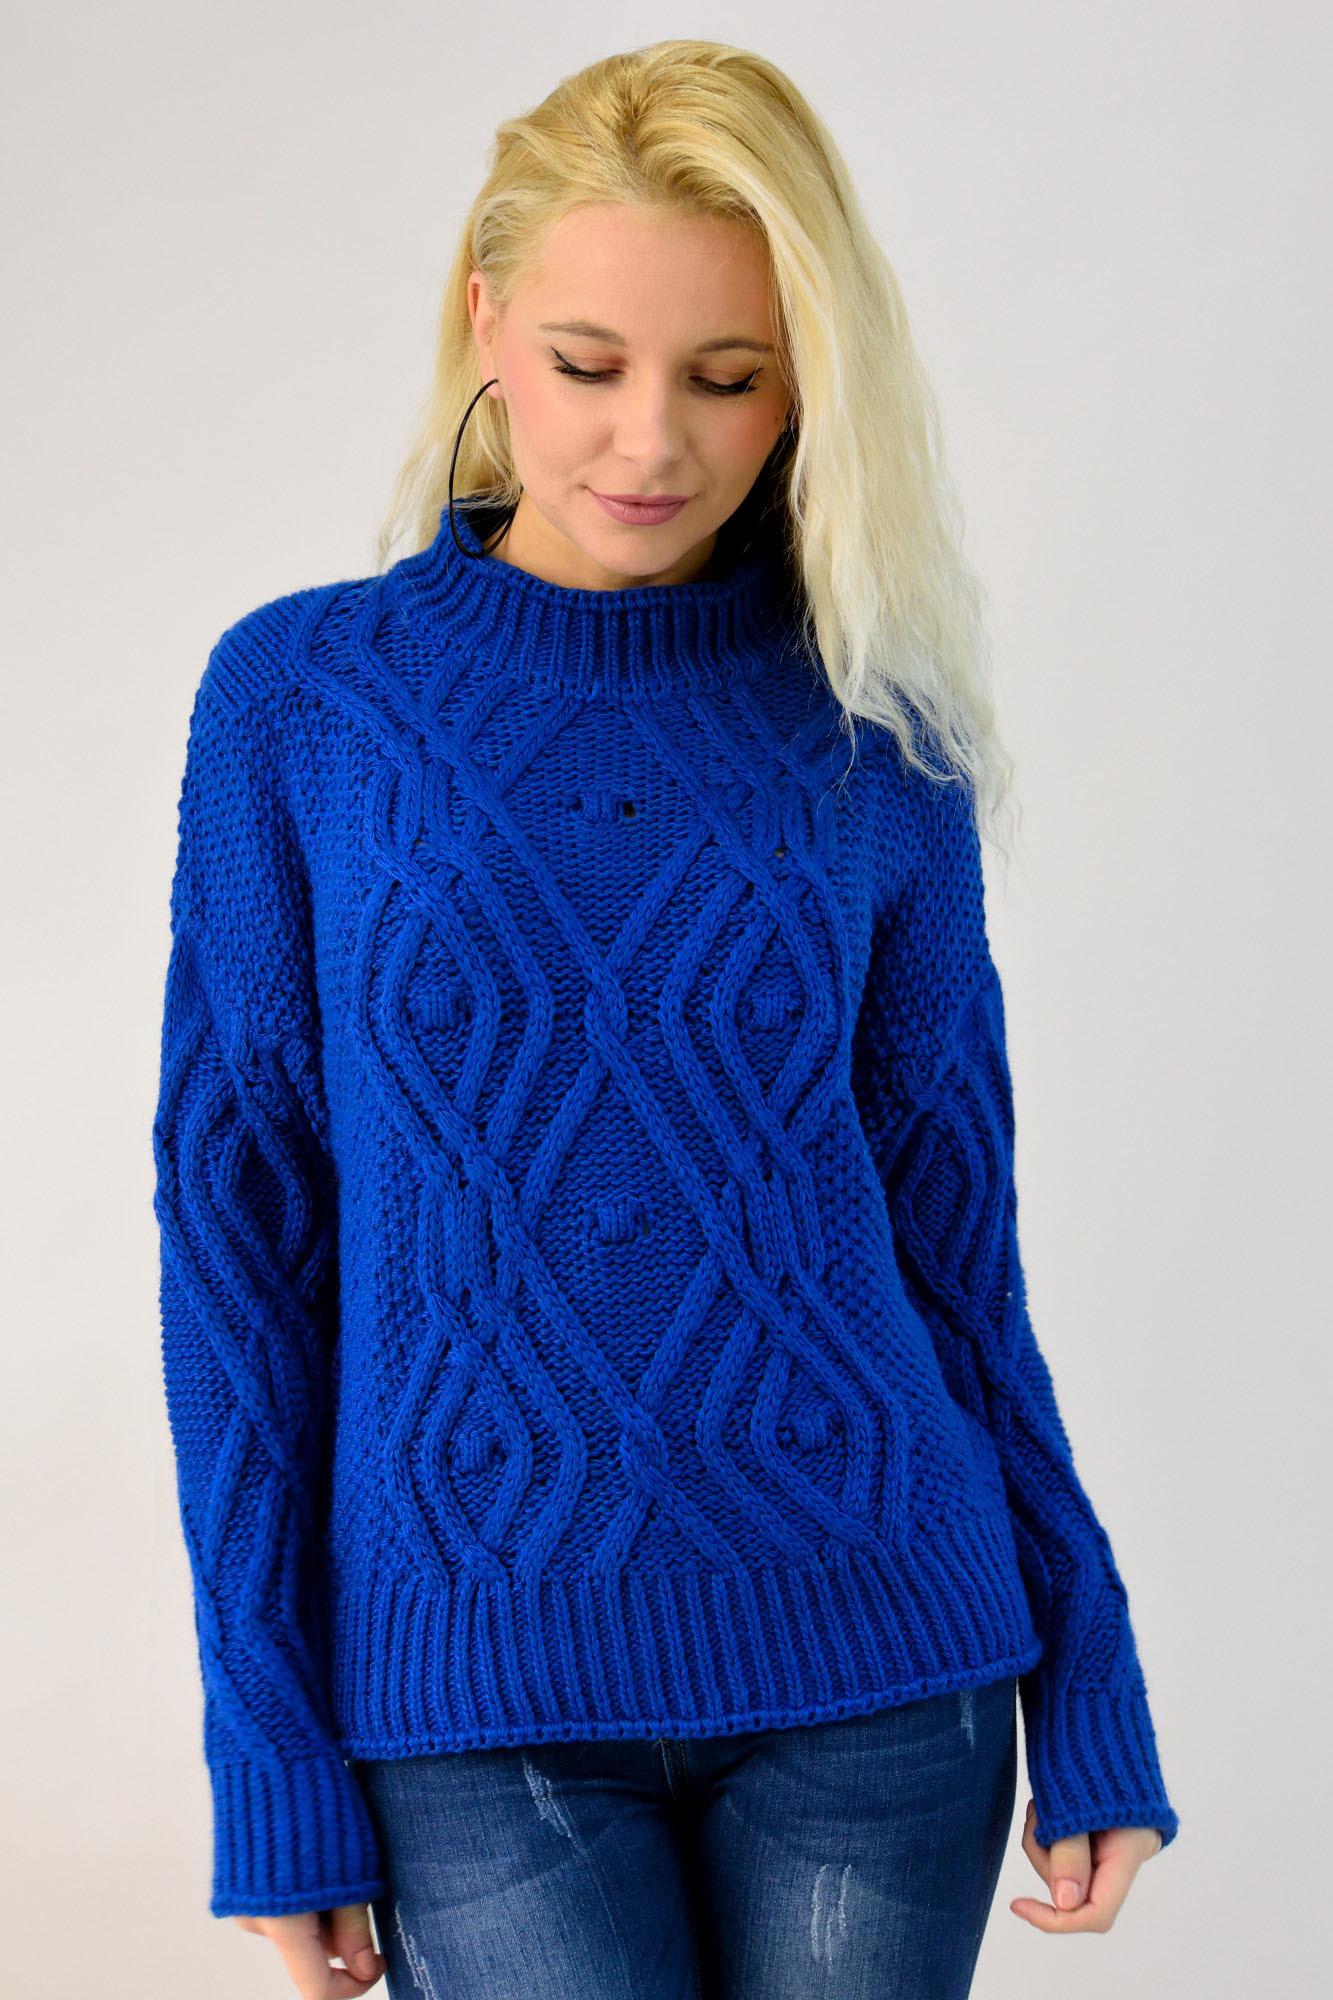 e344ac9170a0 Γυναικείο πλεκτό πουλόβερ με πλεξούδα. Tap to expand